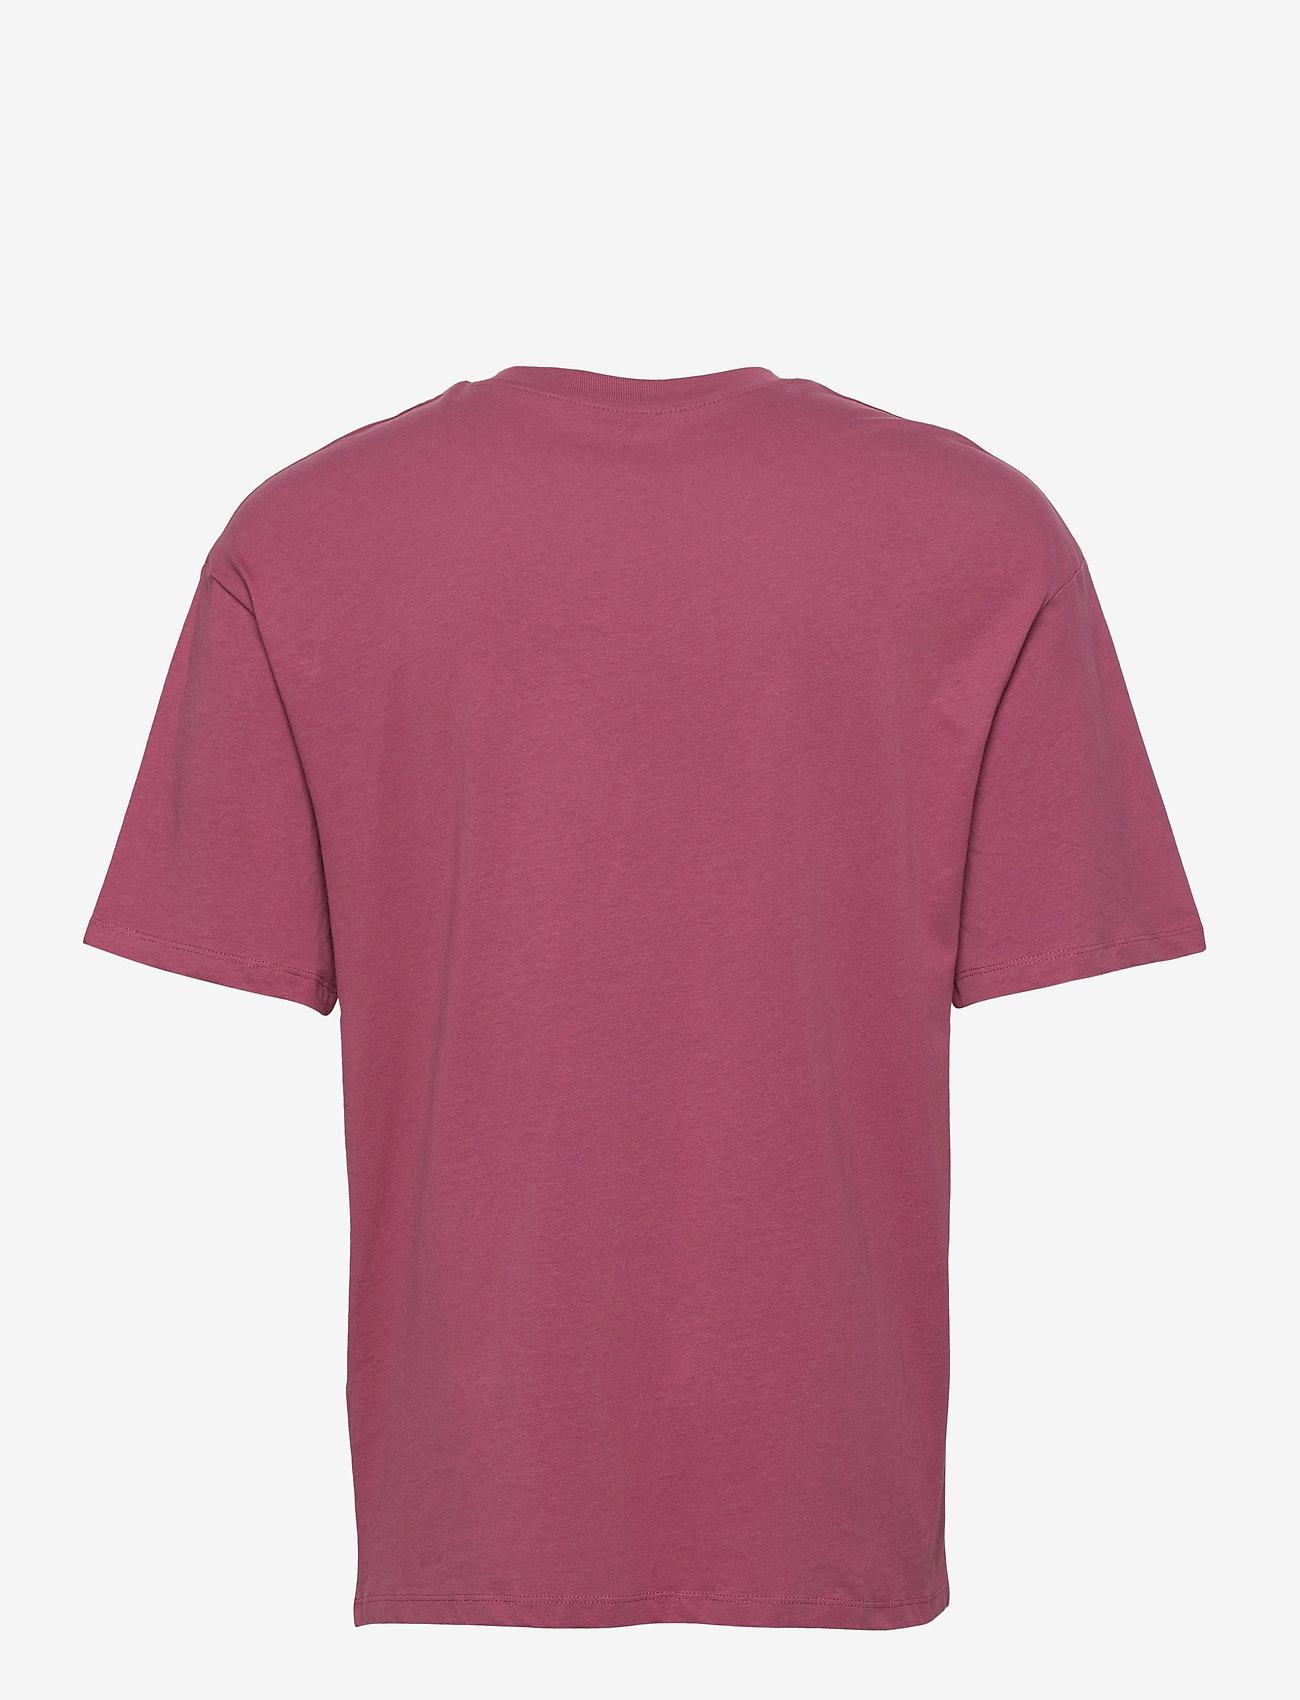 Jack & Jones - JORBRINK TEE SS CREW NECK - basic t-shirts - hawthorn rose - 1